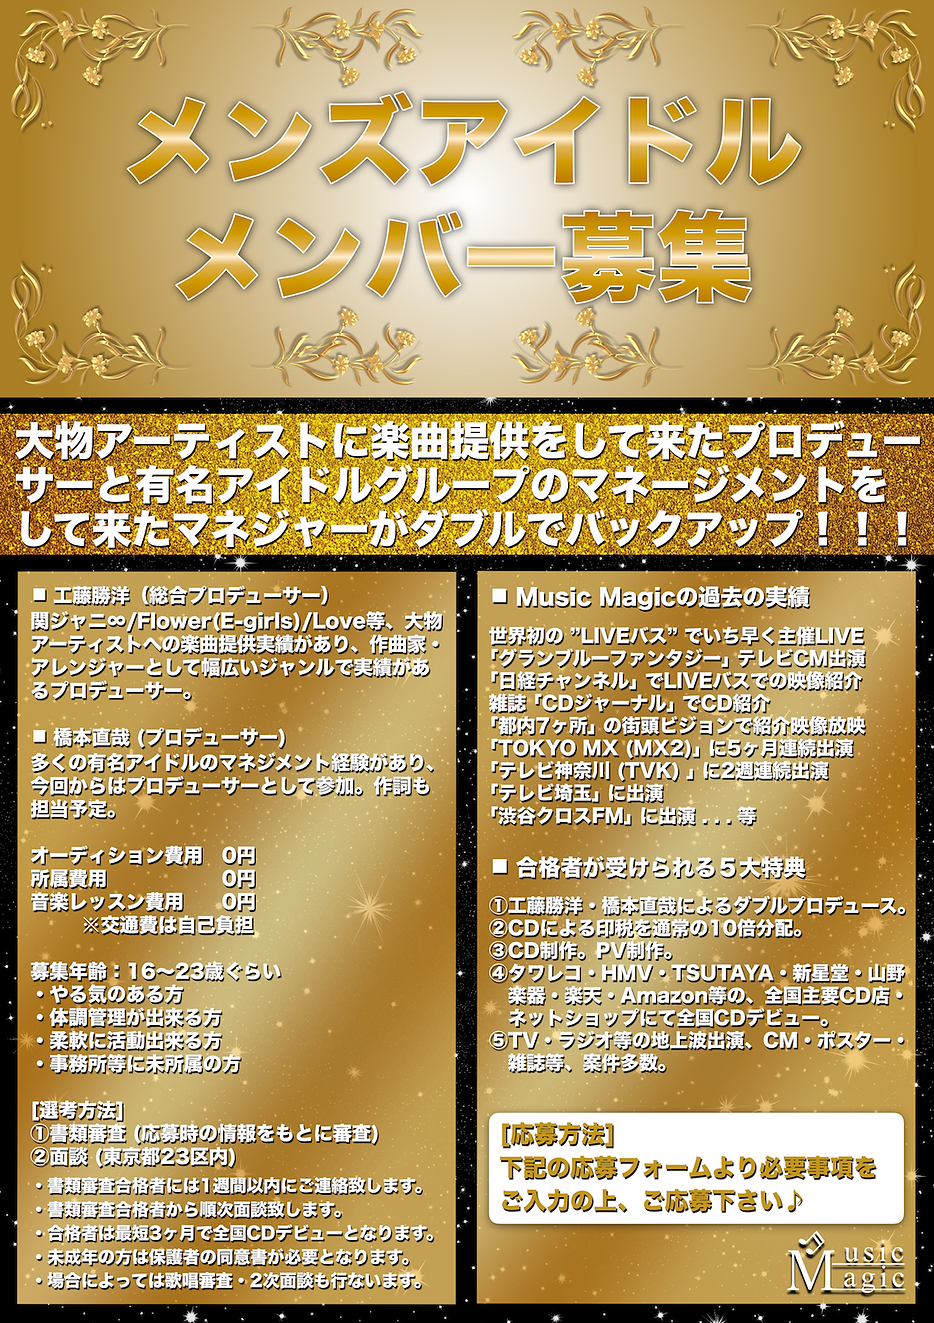 Music Magic メンズアイドル オーディション 1-2.png